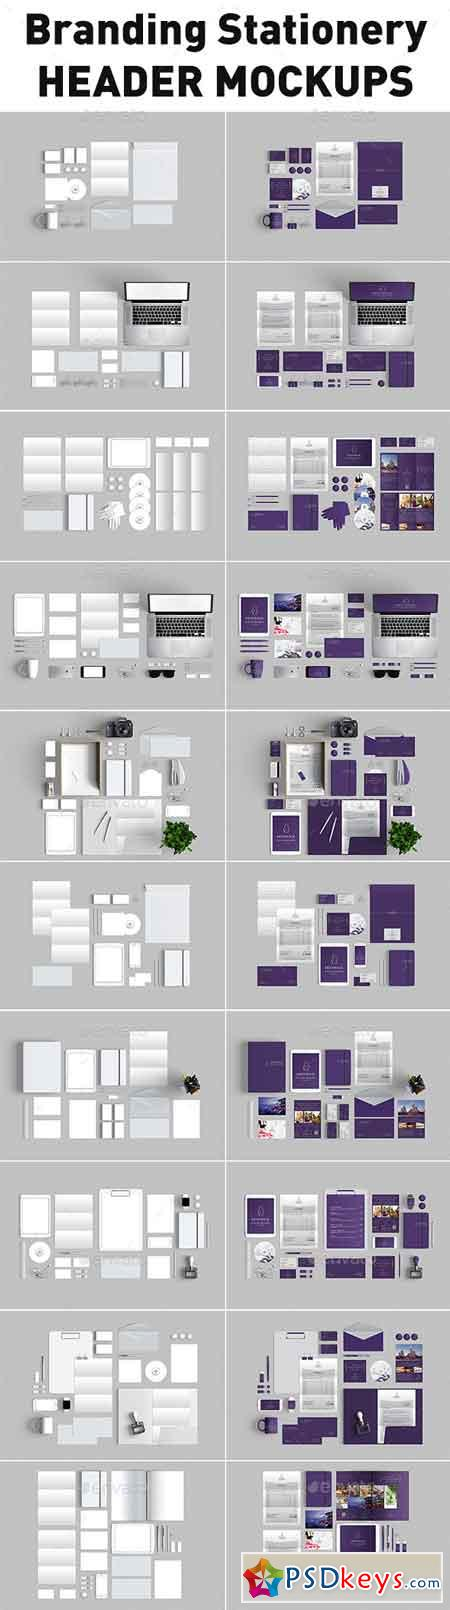 10 Branding Stationery Mockups 11033440